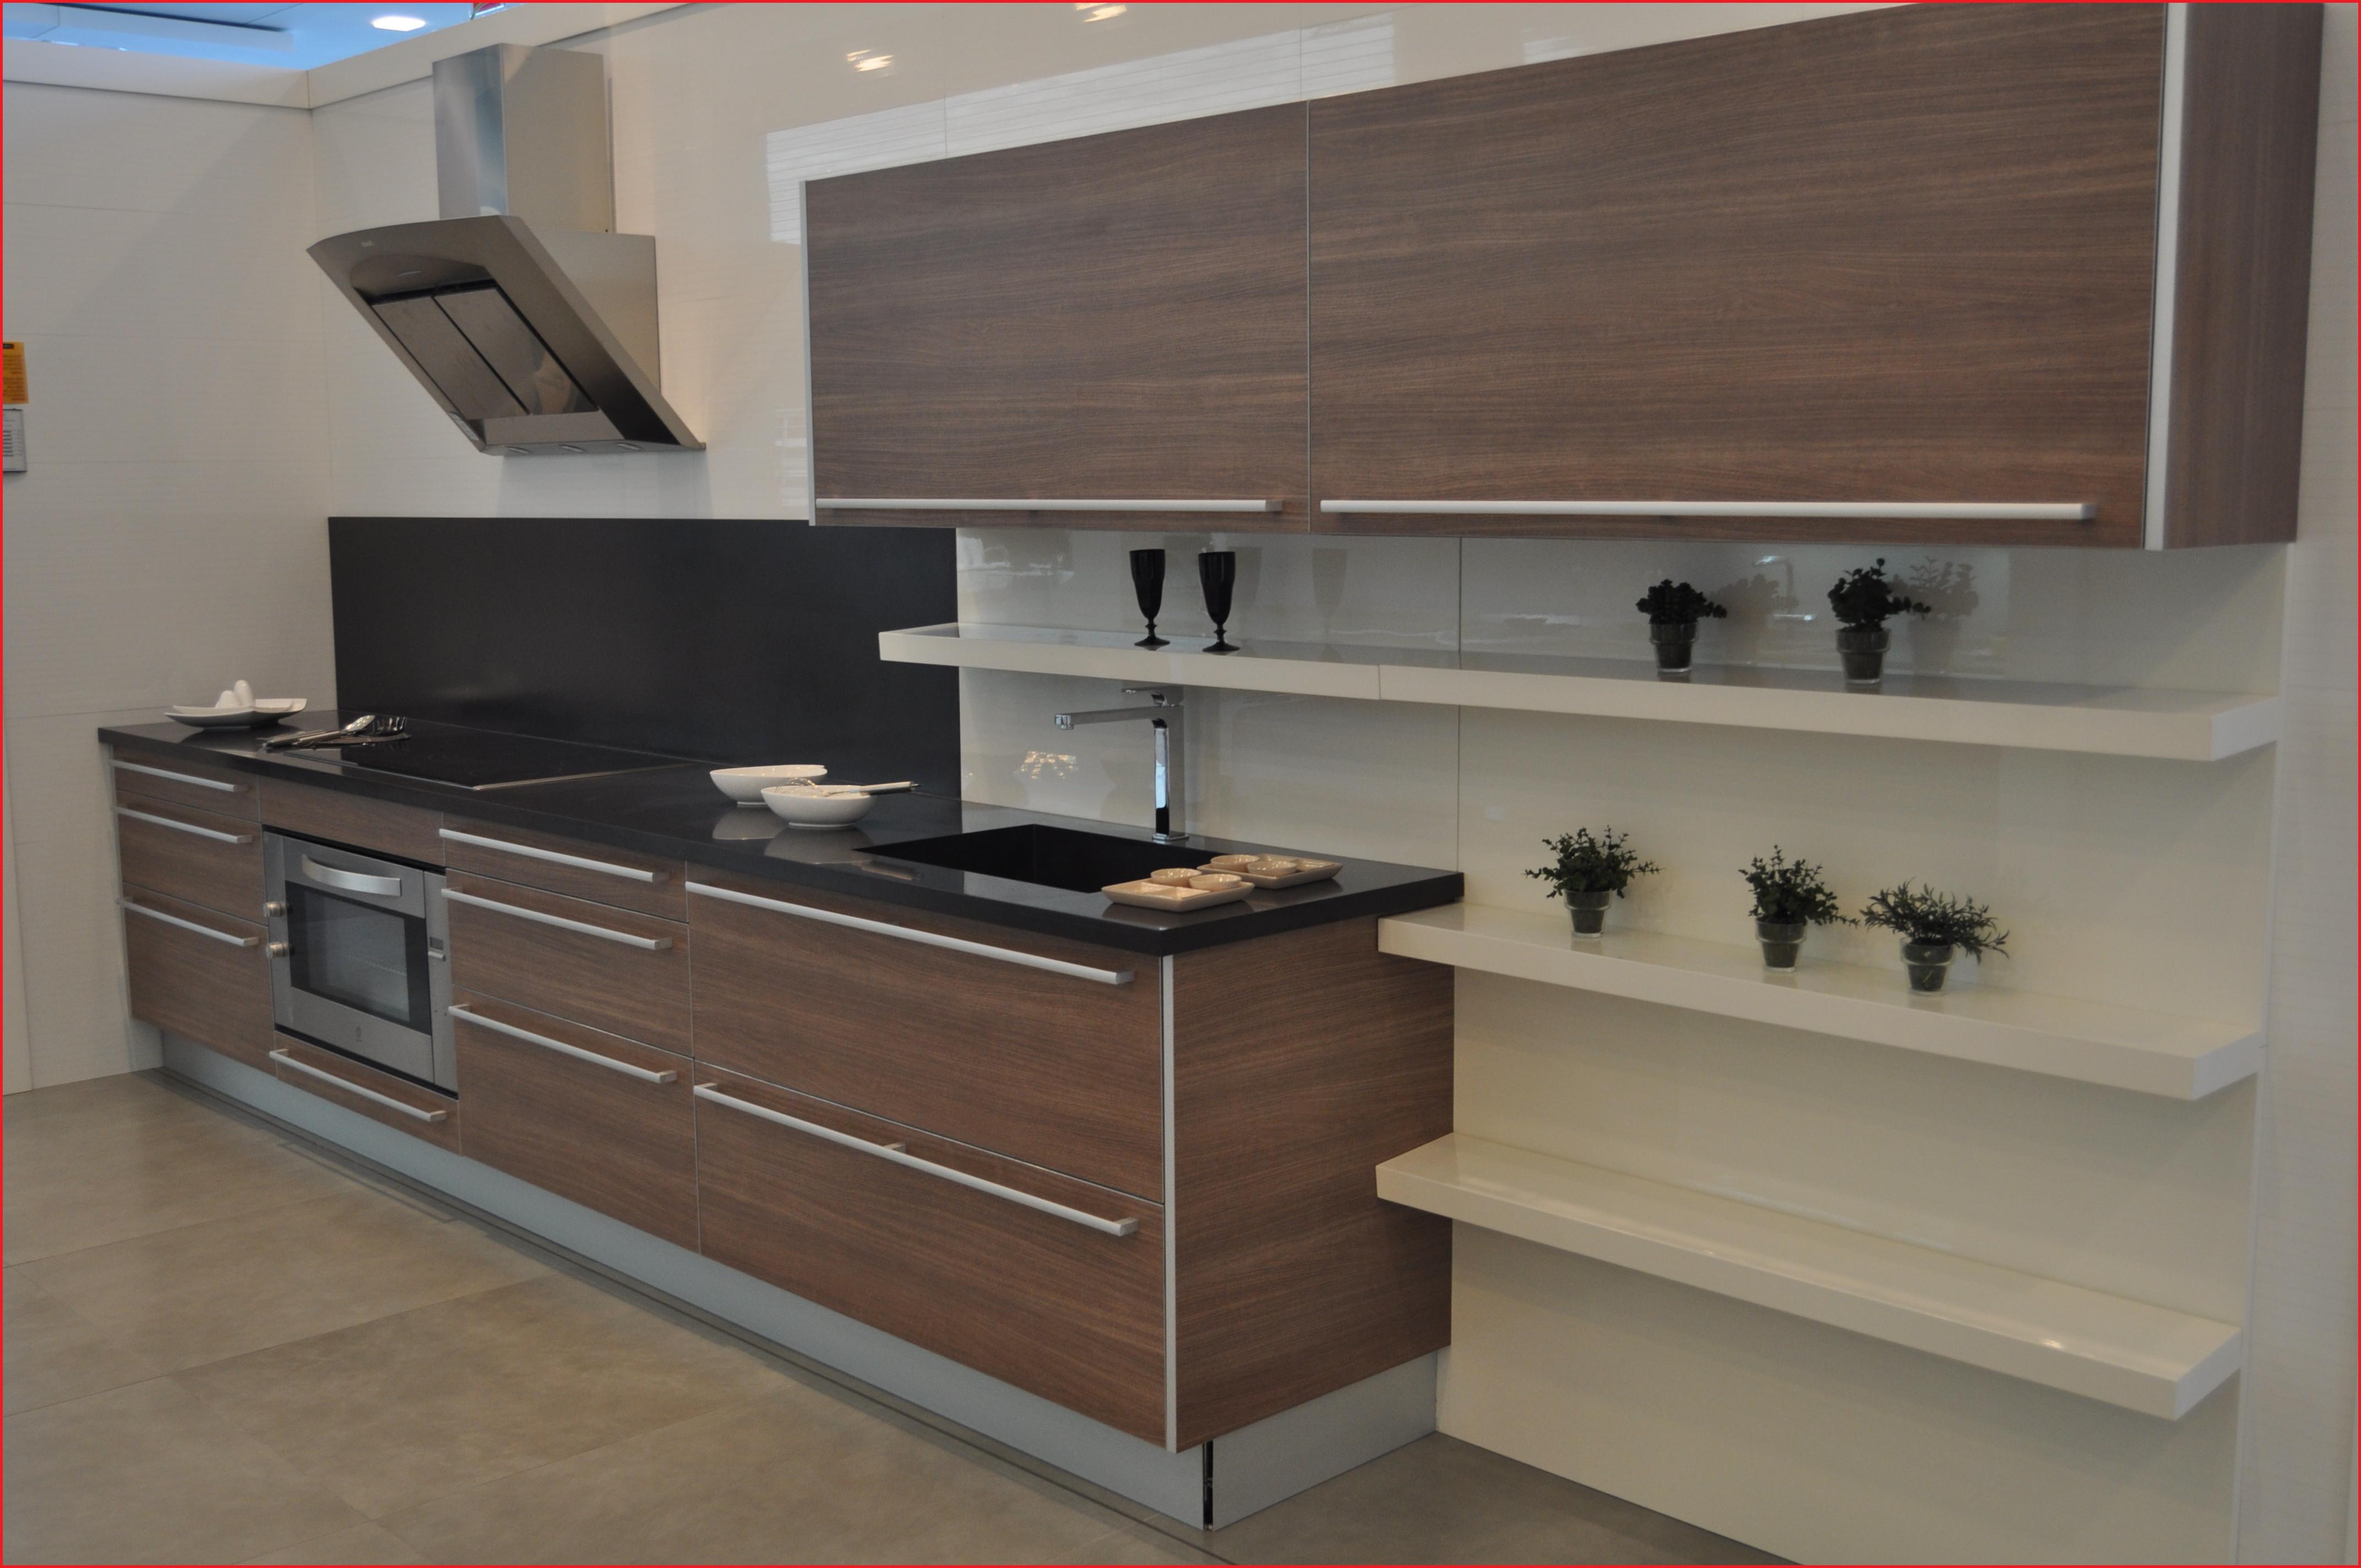 Muebles De Cocina En Zaragoza E9dx Muebles De Cocina Zaragoza Reformas De Cocinas